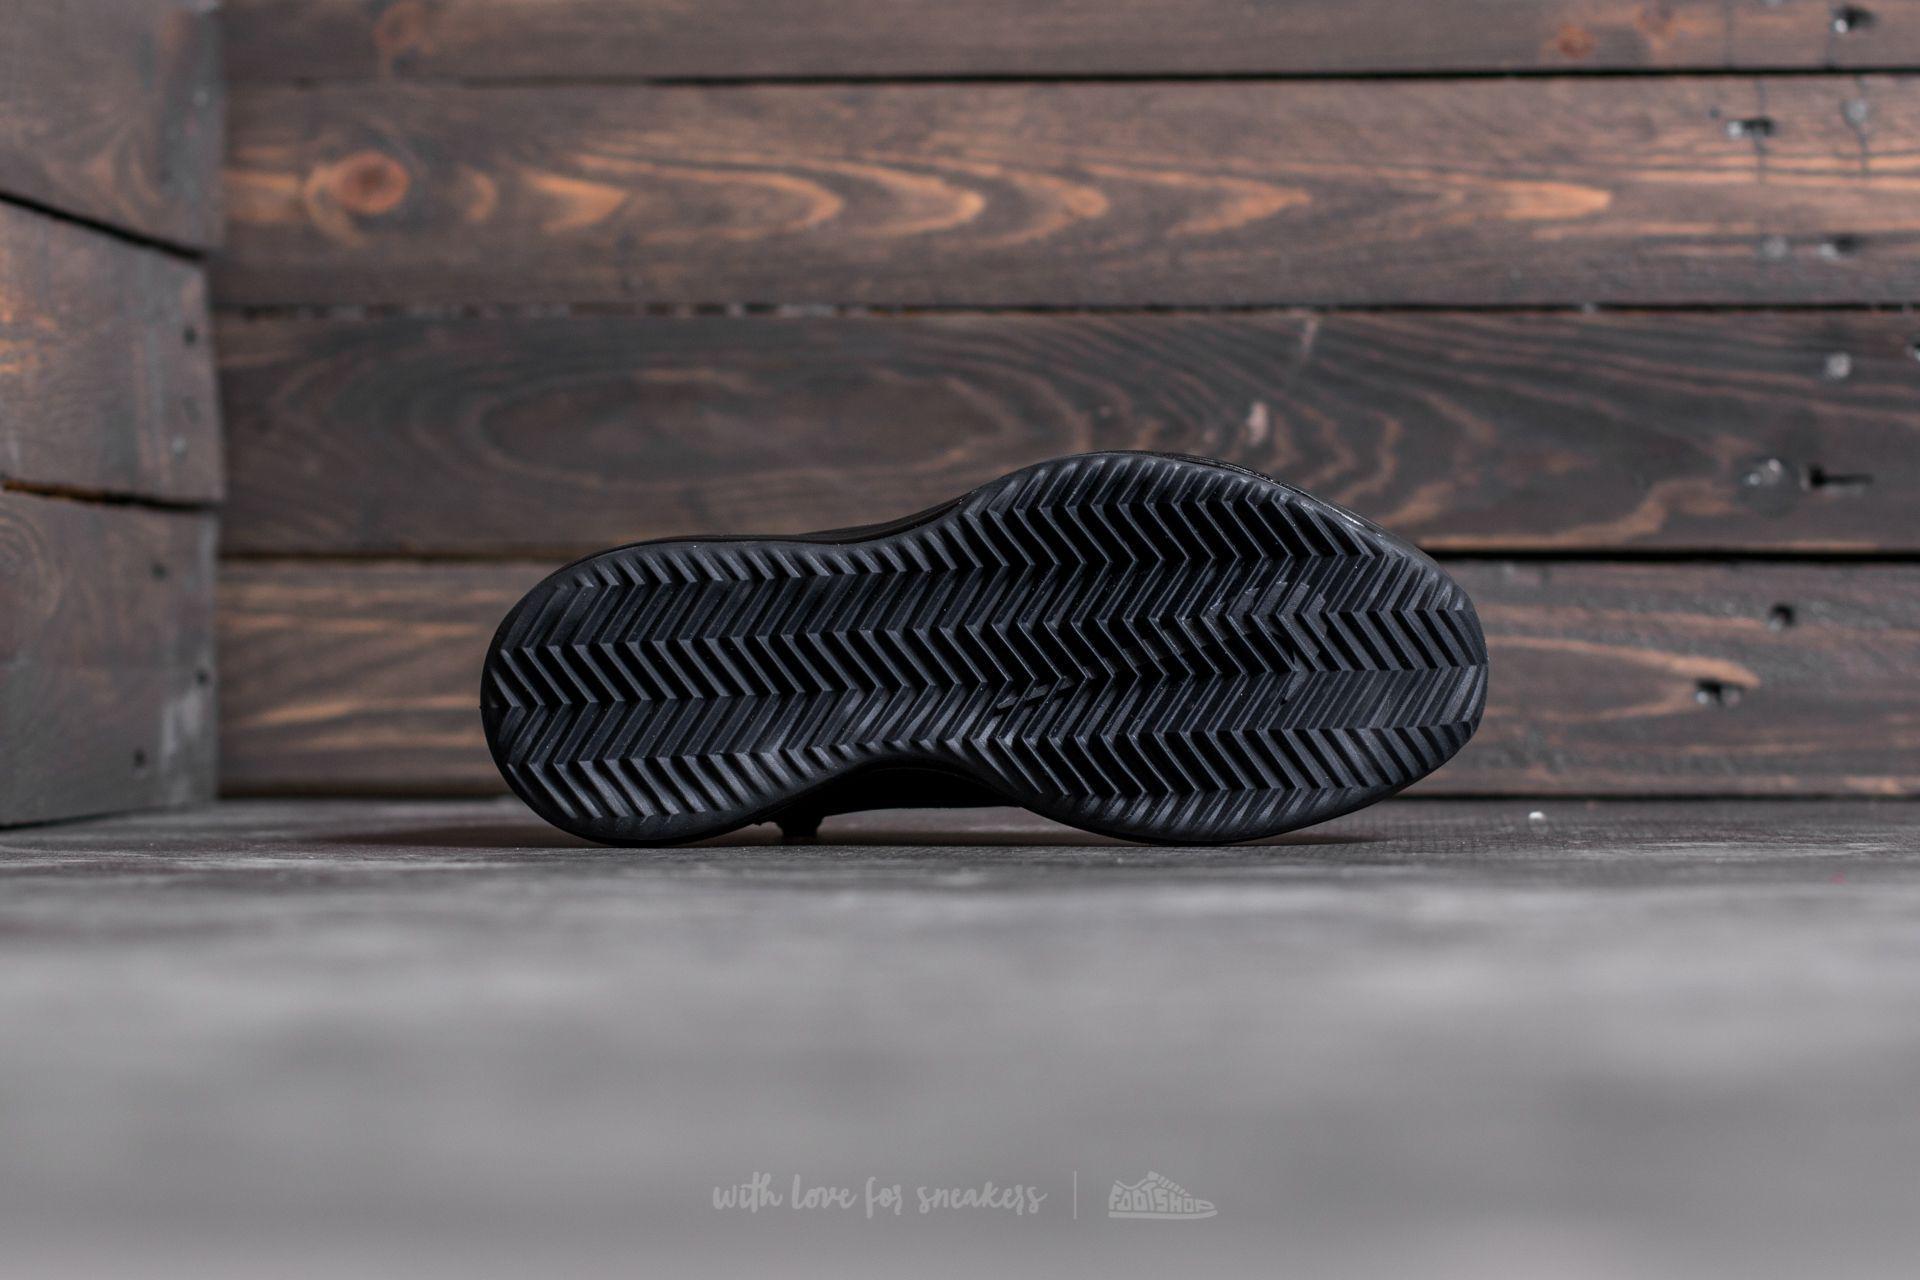 59049e2dbc42 ... Lyst - Nike W Zoom Modairna Black Black-anthracite in Black ...